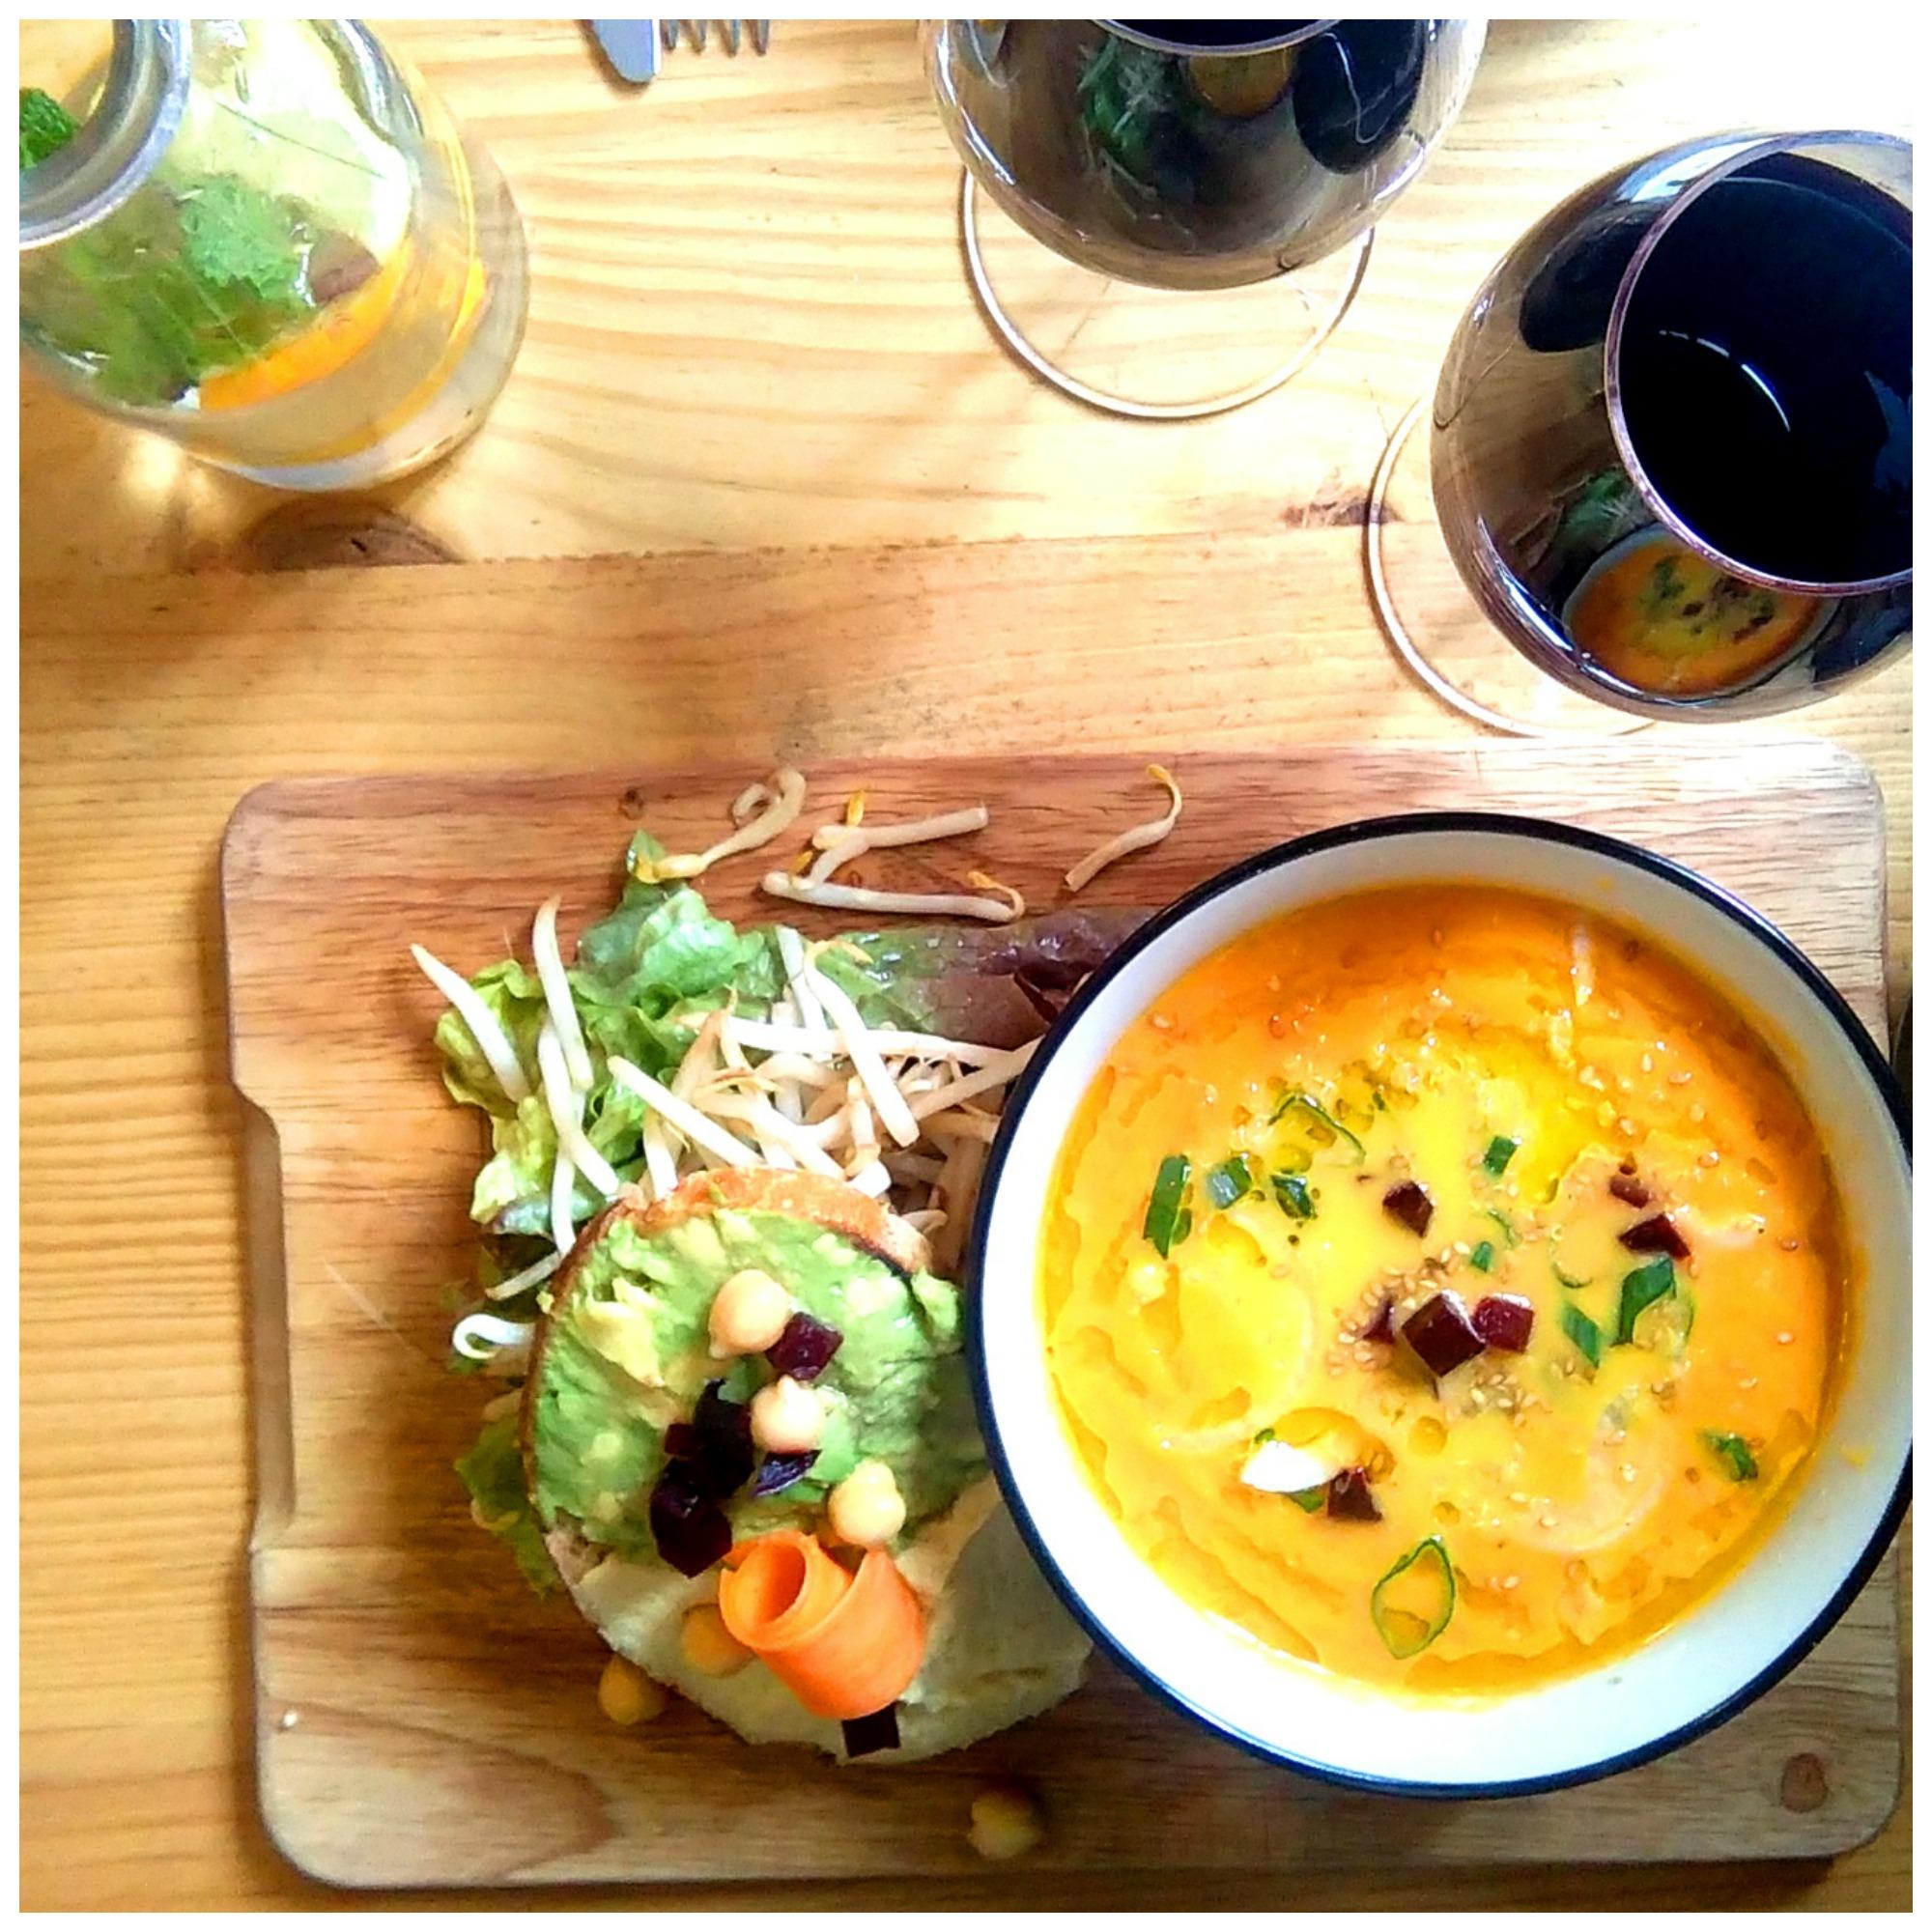 resto vegan bordeaux kitchen garden avocado toast bordelaise by mimi. Black Bedroom Furniture Sets. Home Design Ideas